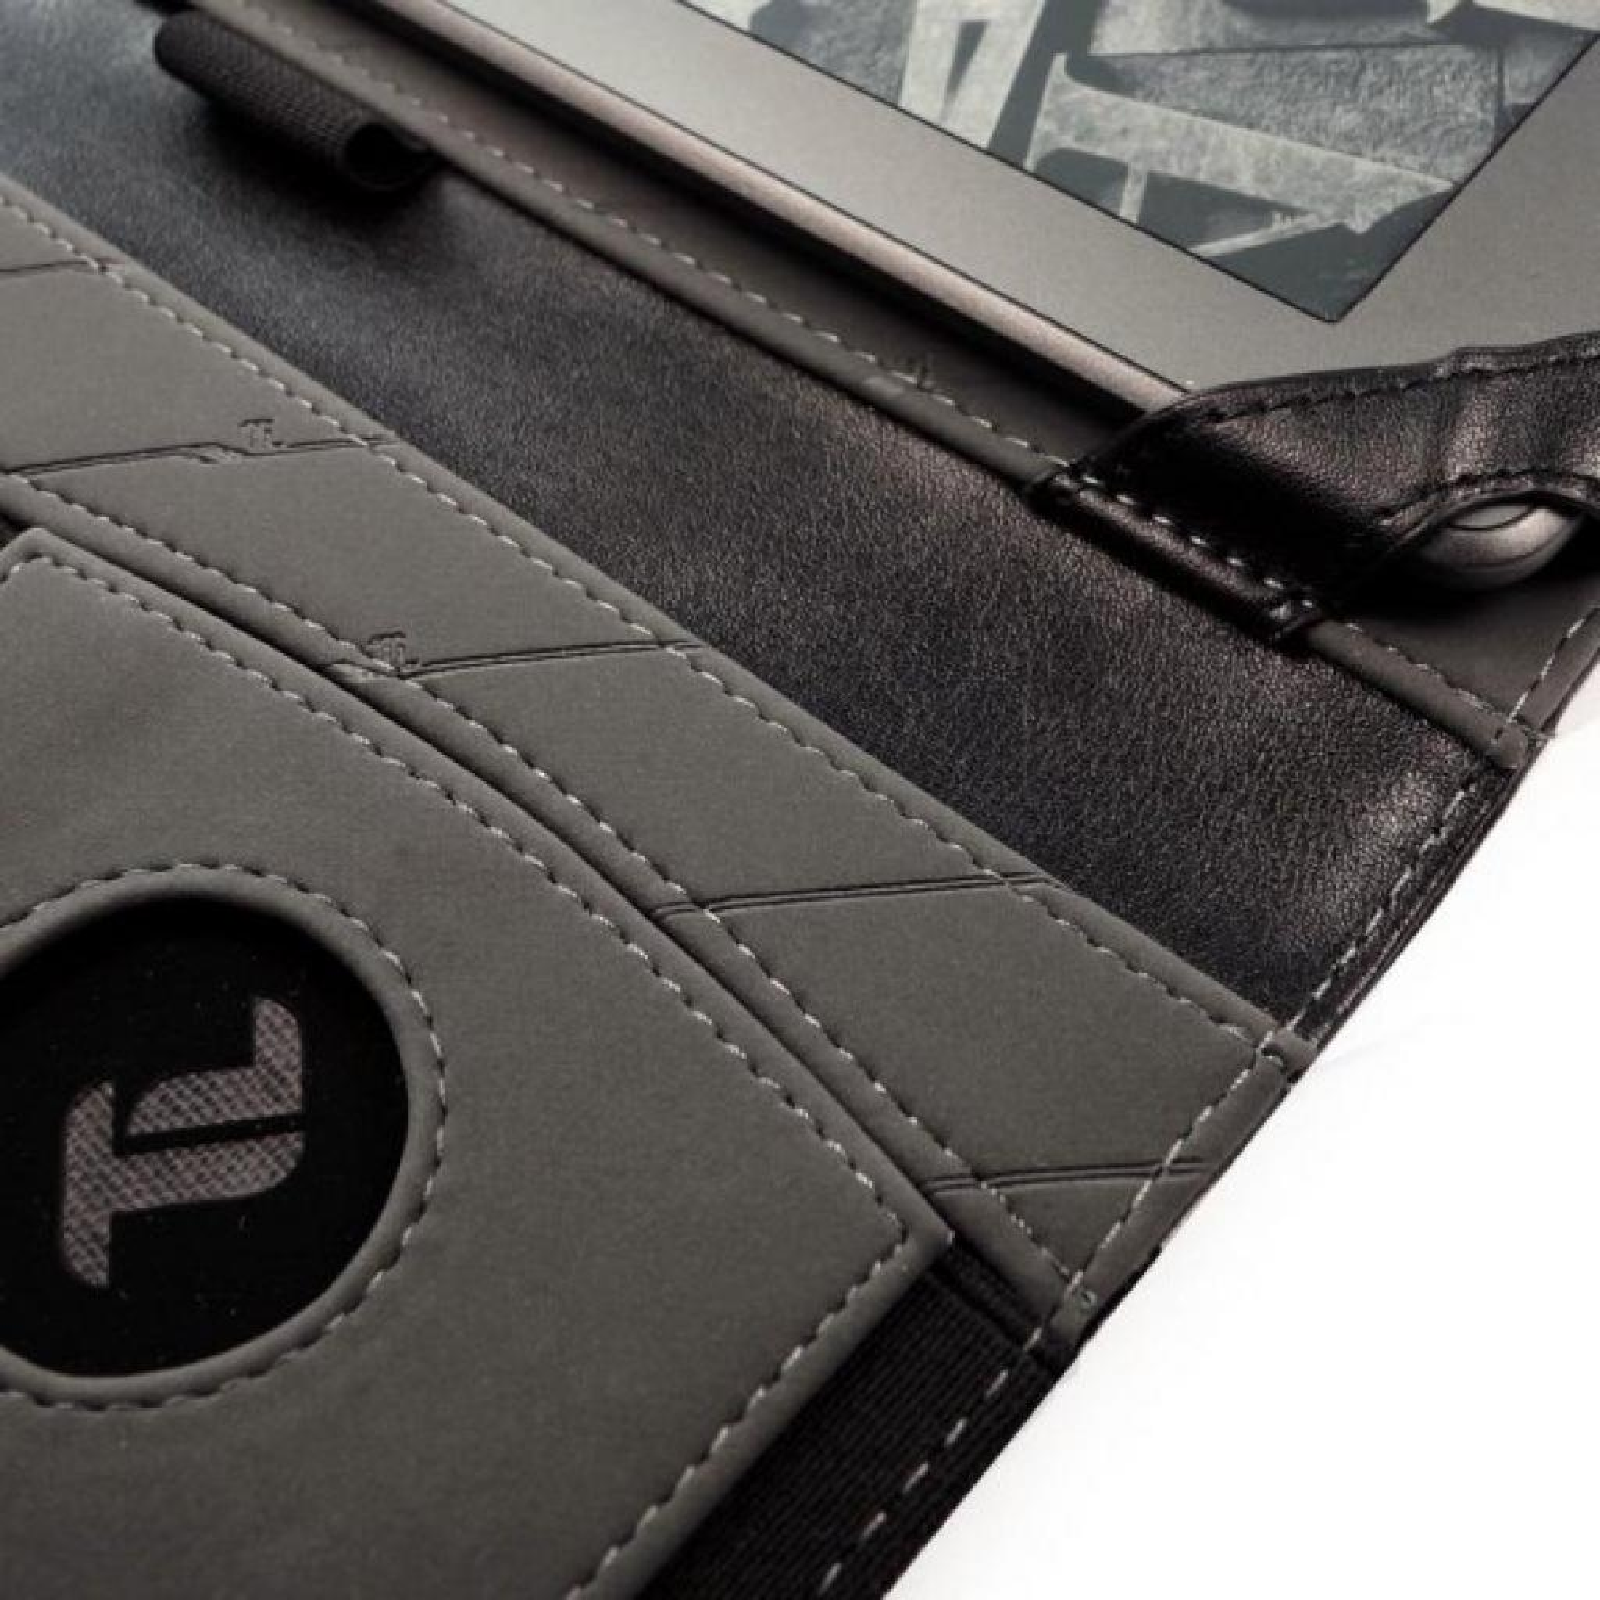 Чехол для электронной книги Tuff-Luv 6 Embrace Plus Leather Napa Black (A10_40) изображение 4